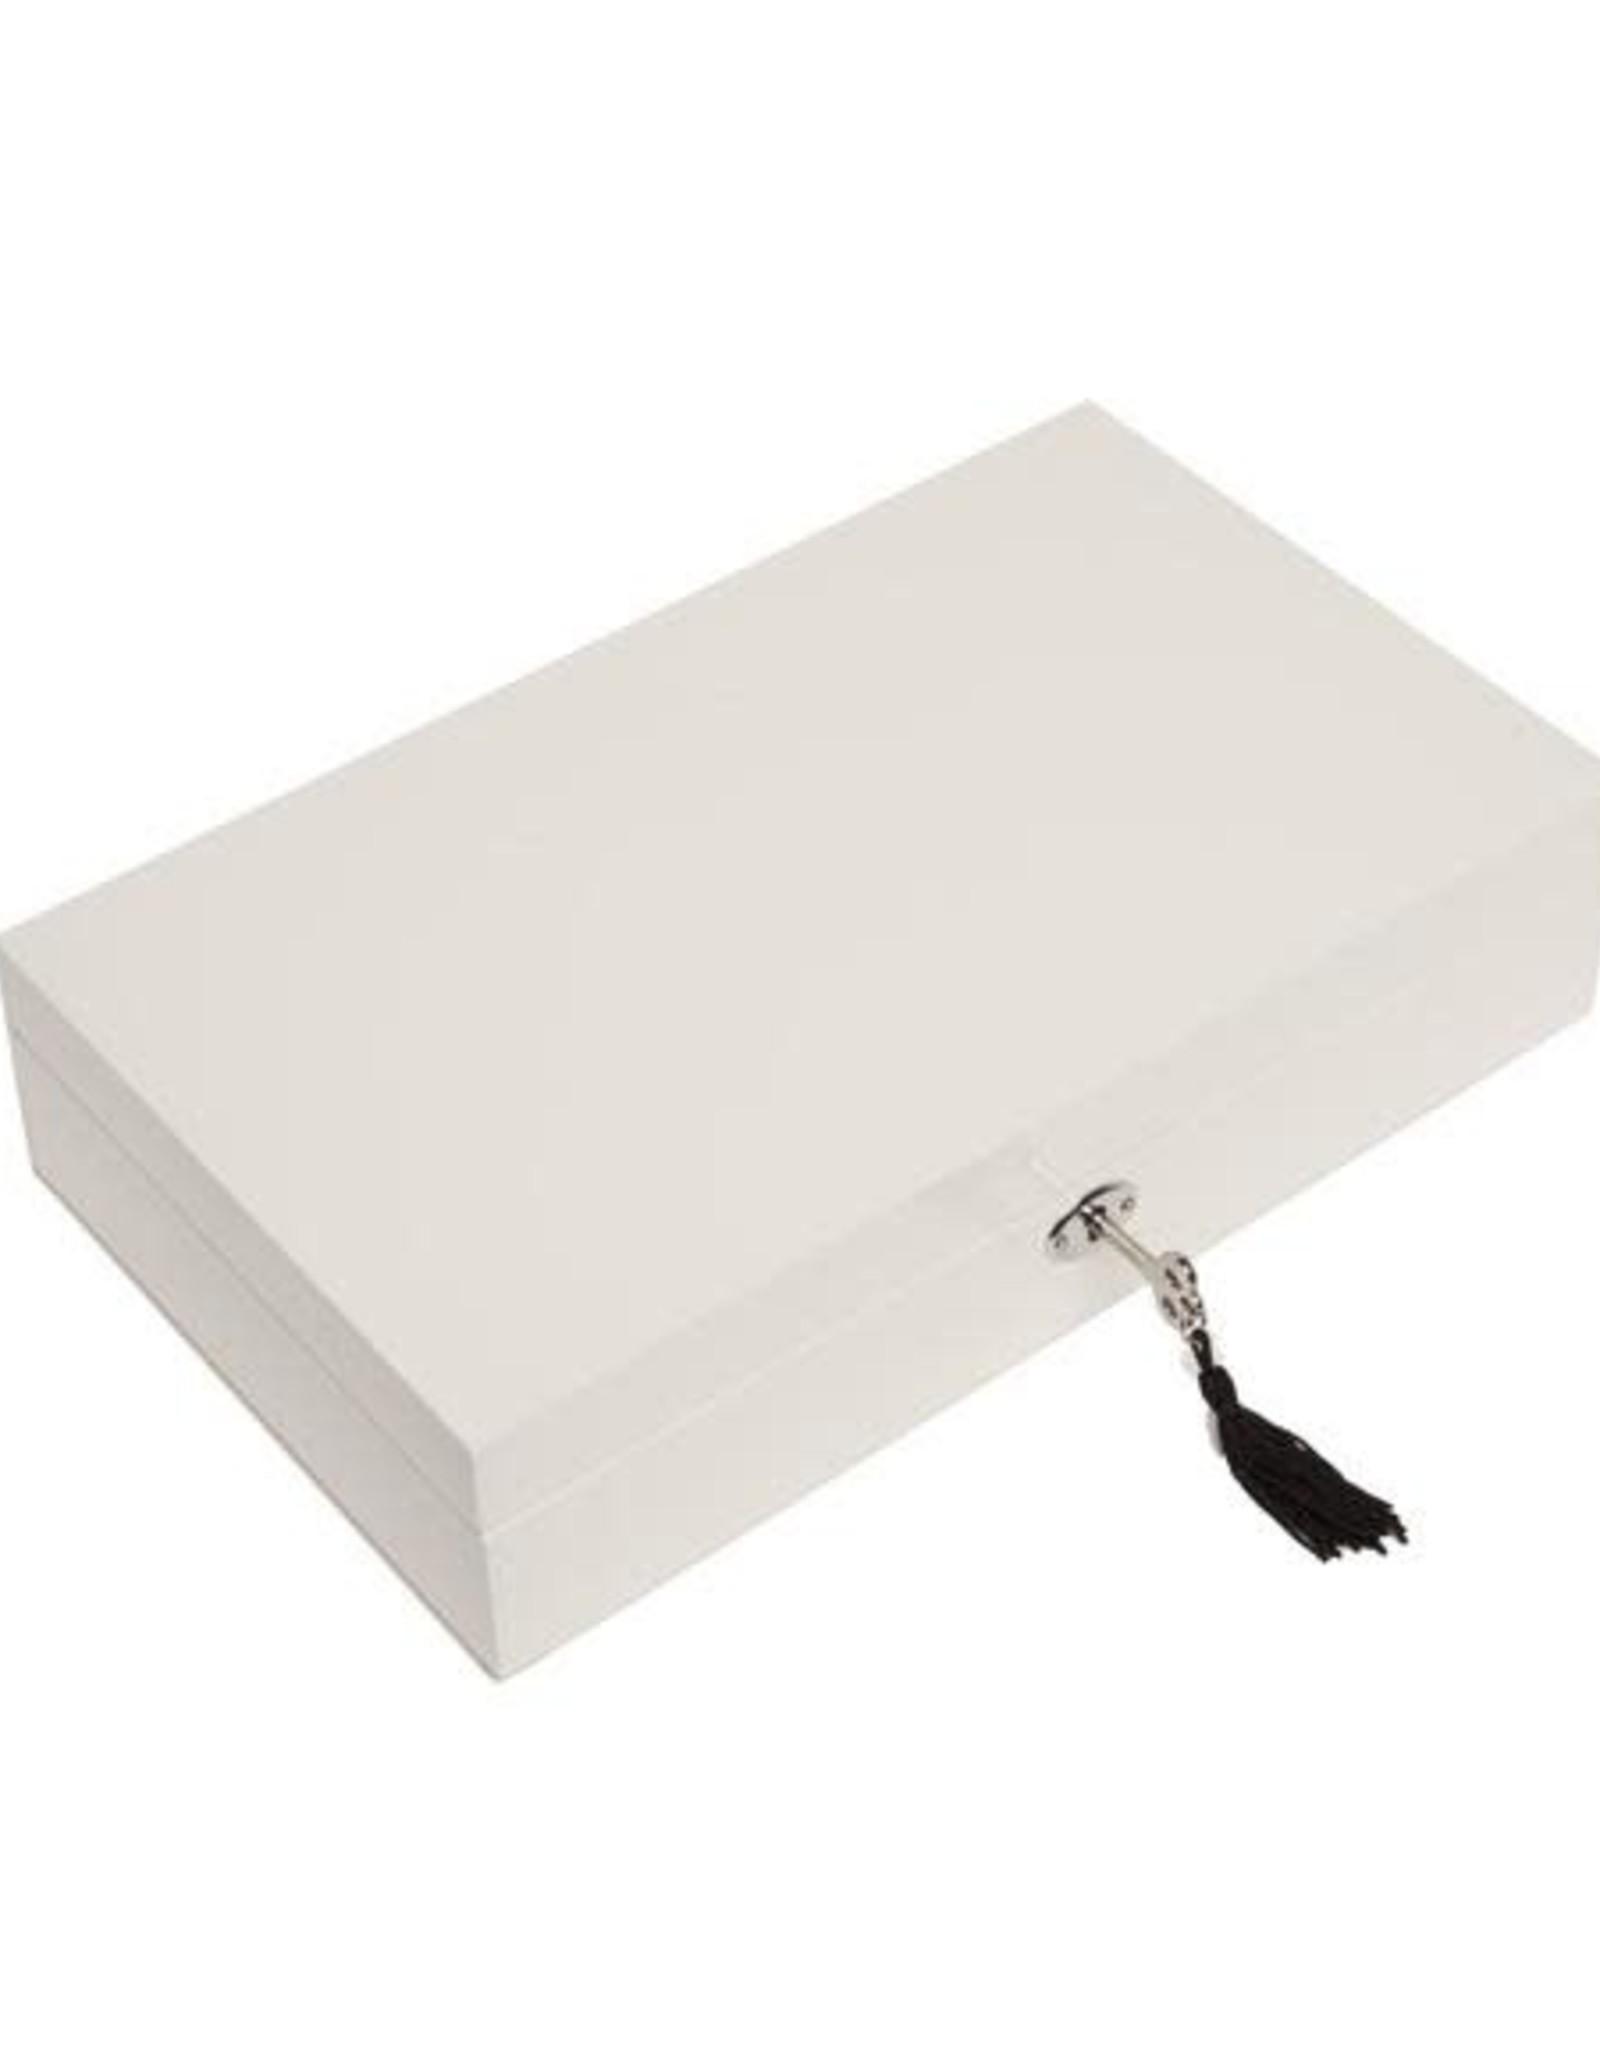 Brouk & Co Jewelry Box White